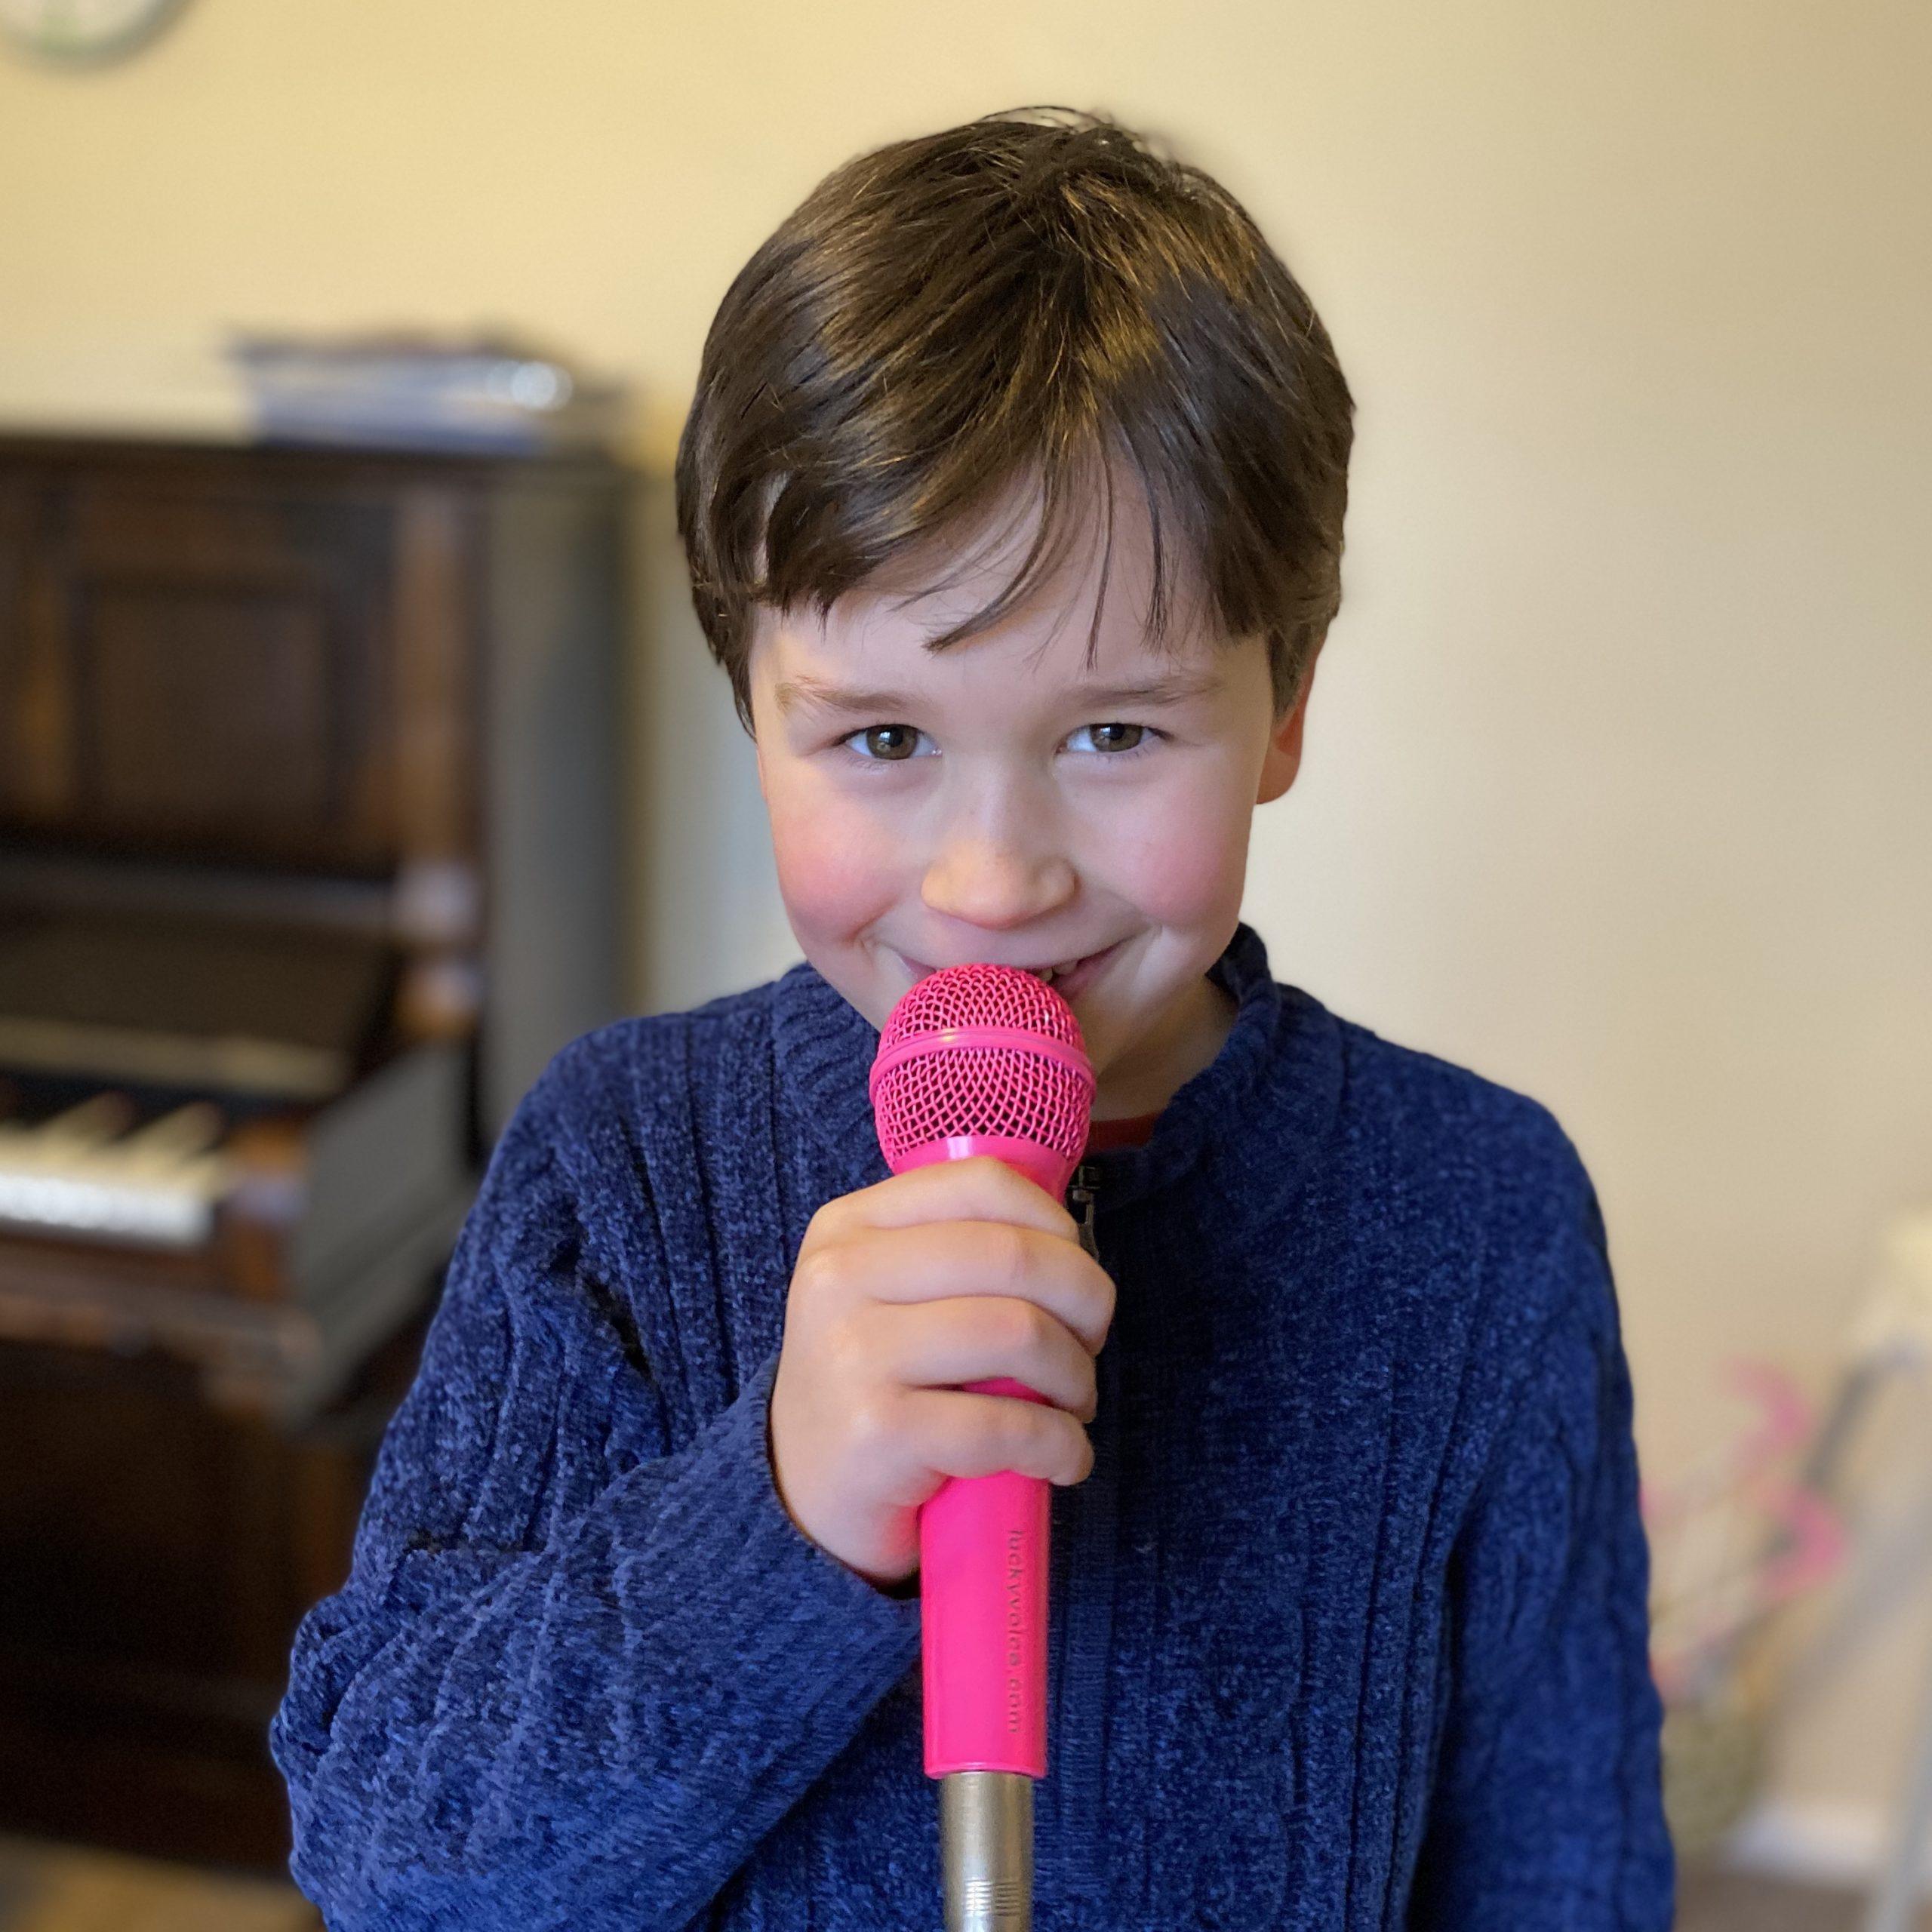 a boy singing in a microphone